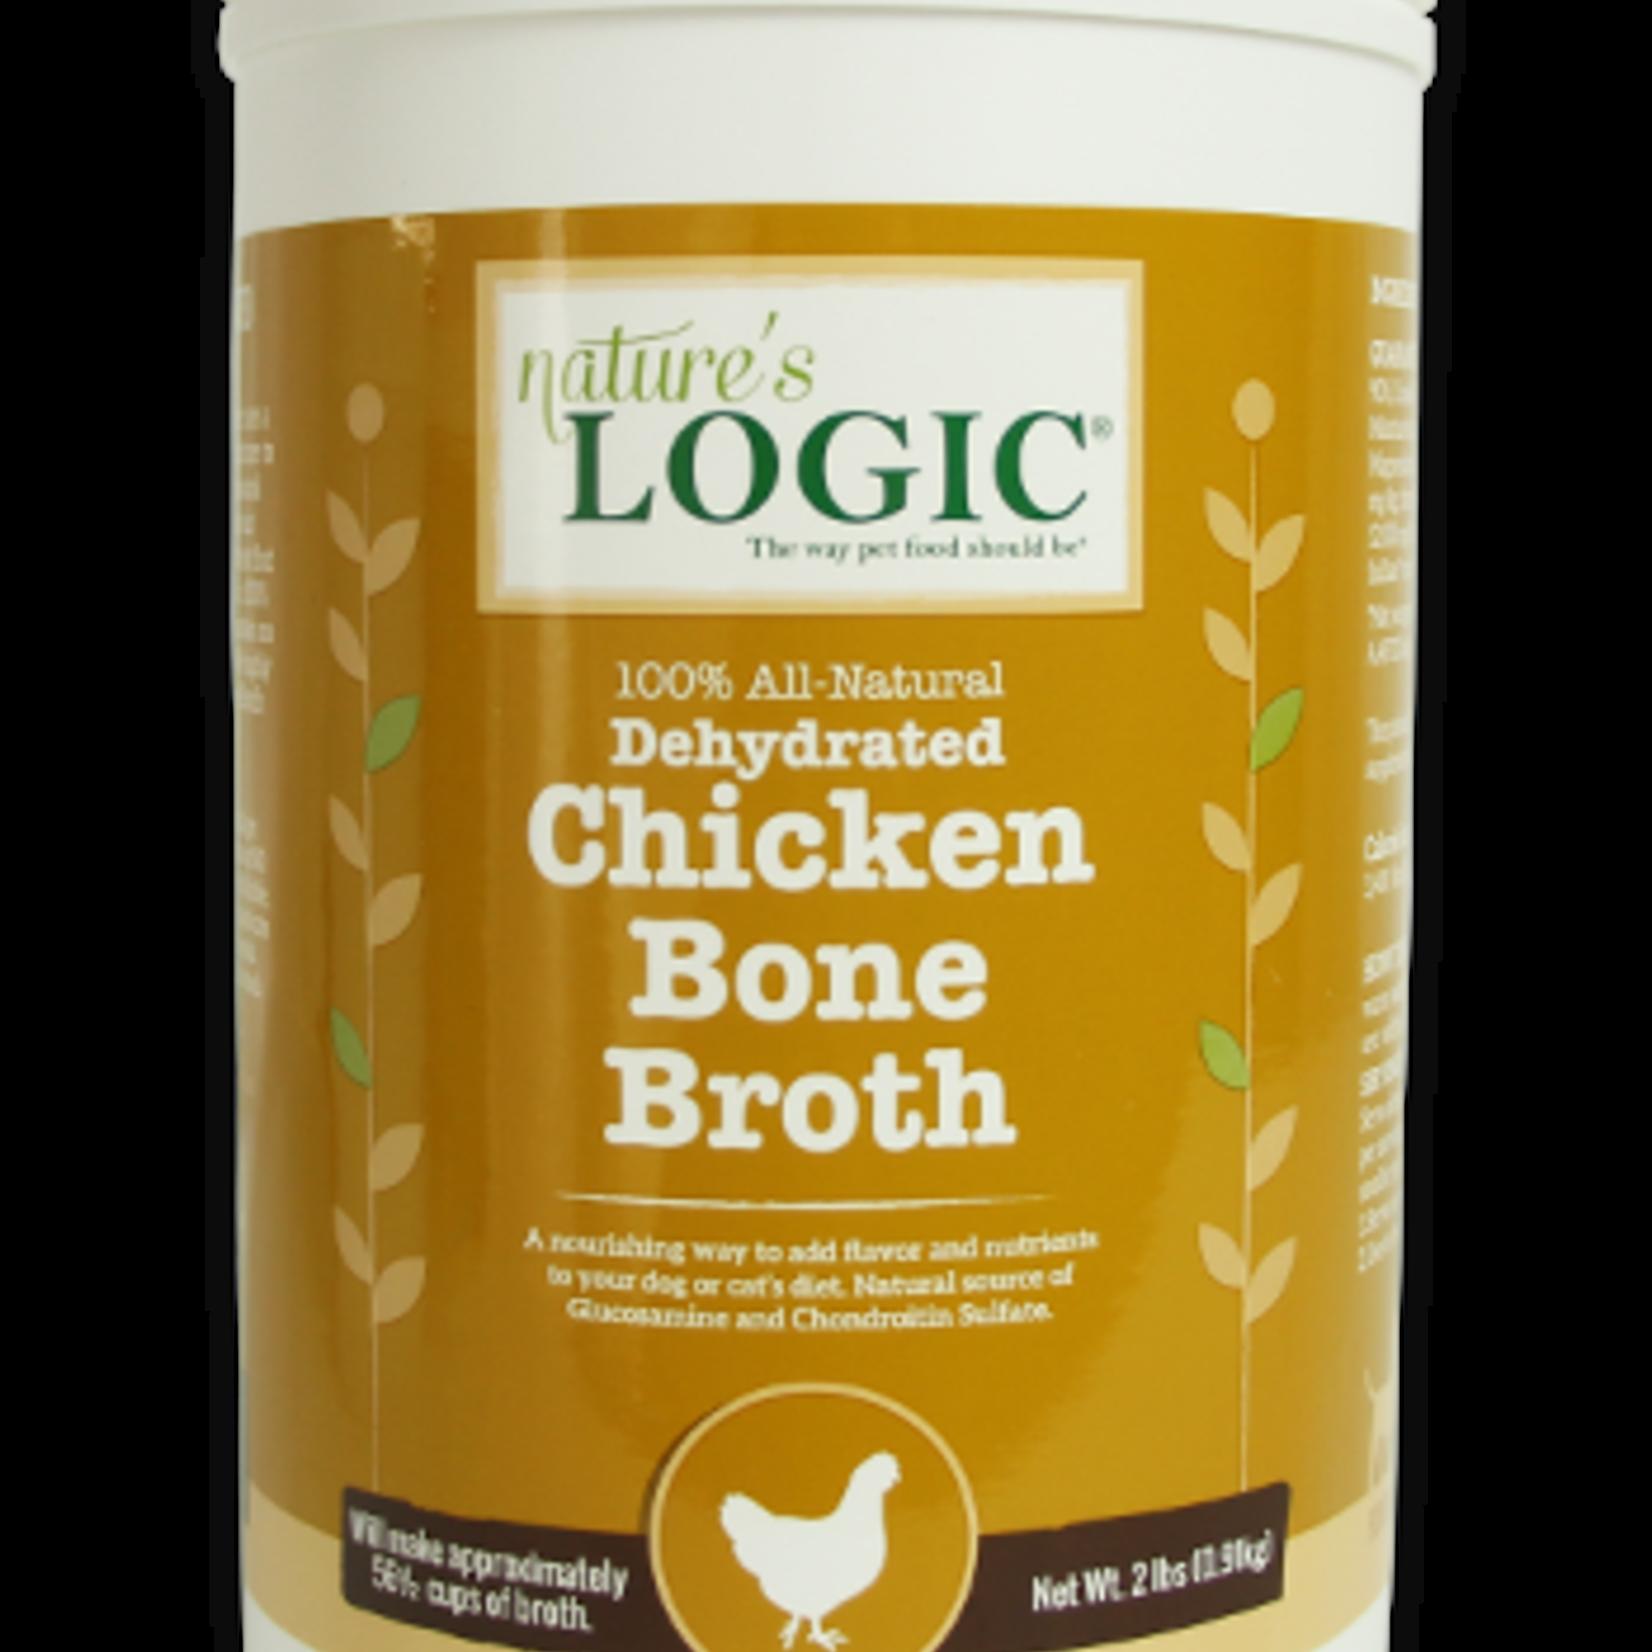 Natures Logic Natures Logic Dehydrated Chicken Bone Broth 6 OZ